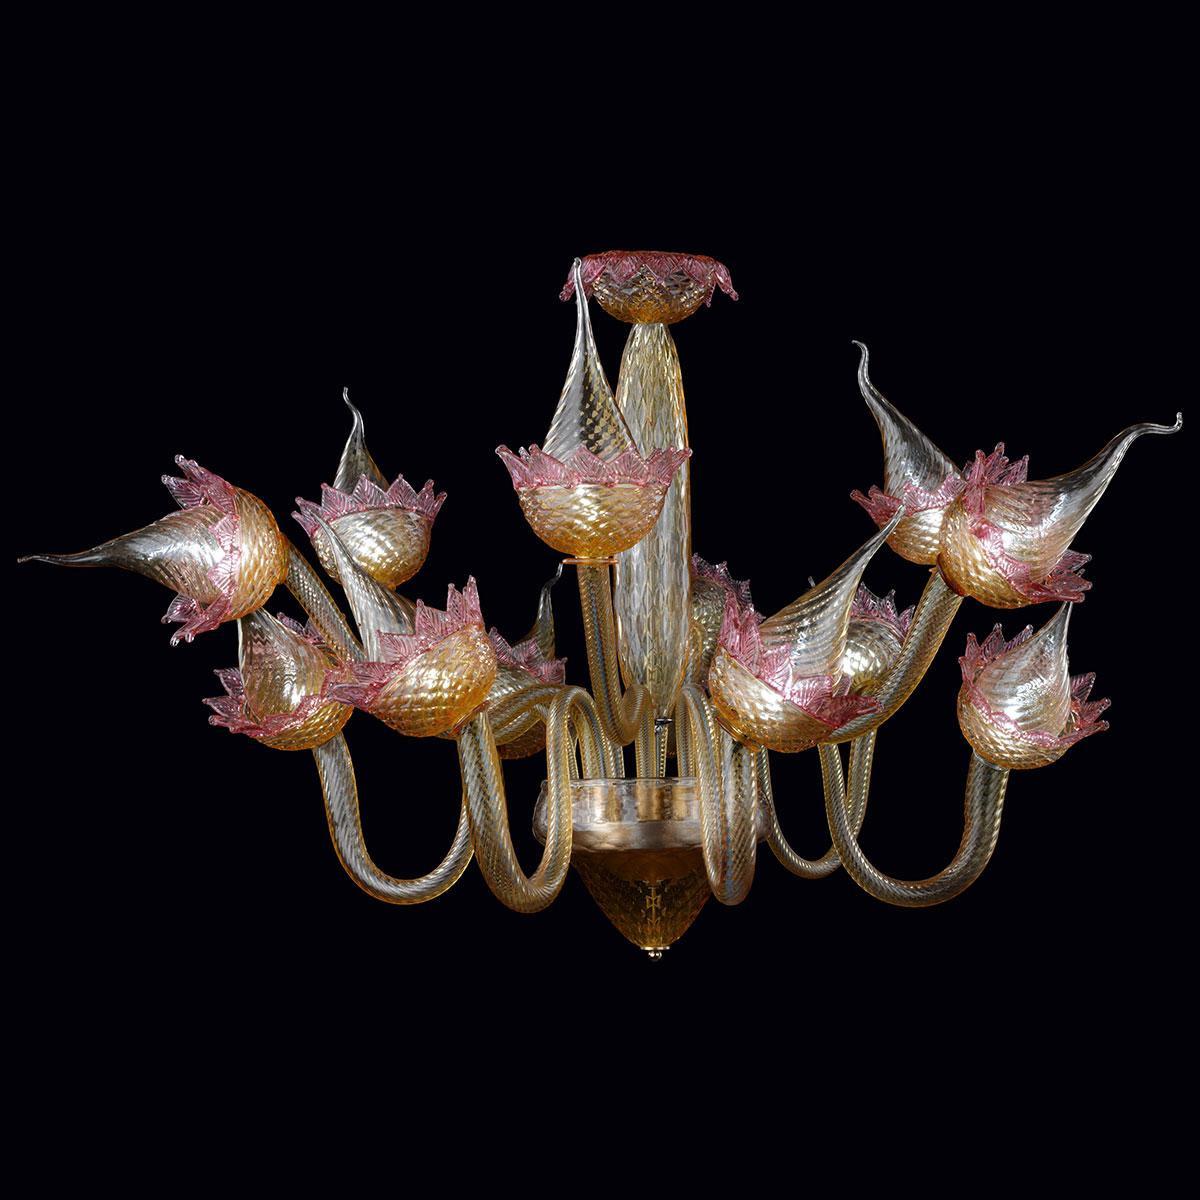 """Fuochifatui"" lustre en cristal de Murano - ambre et rose -"